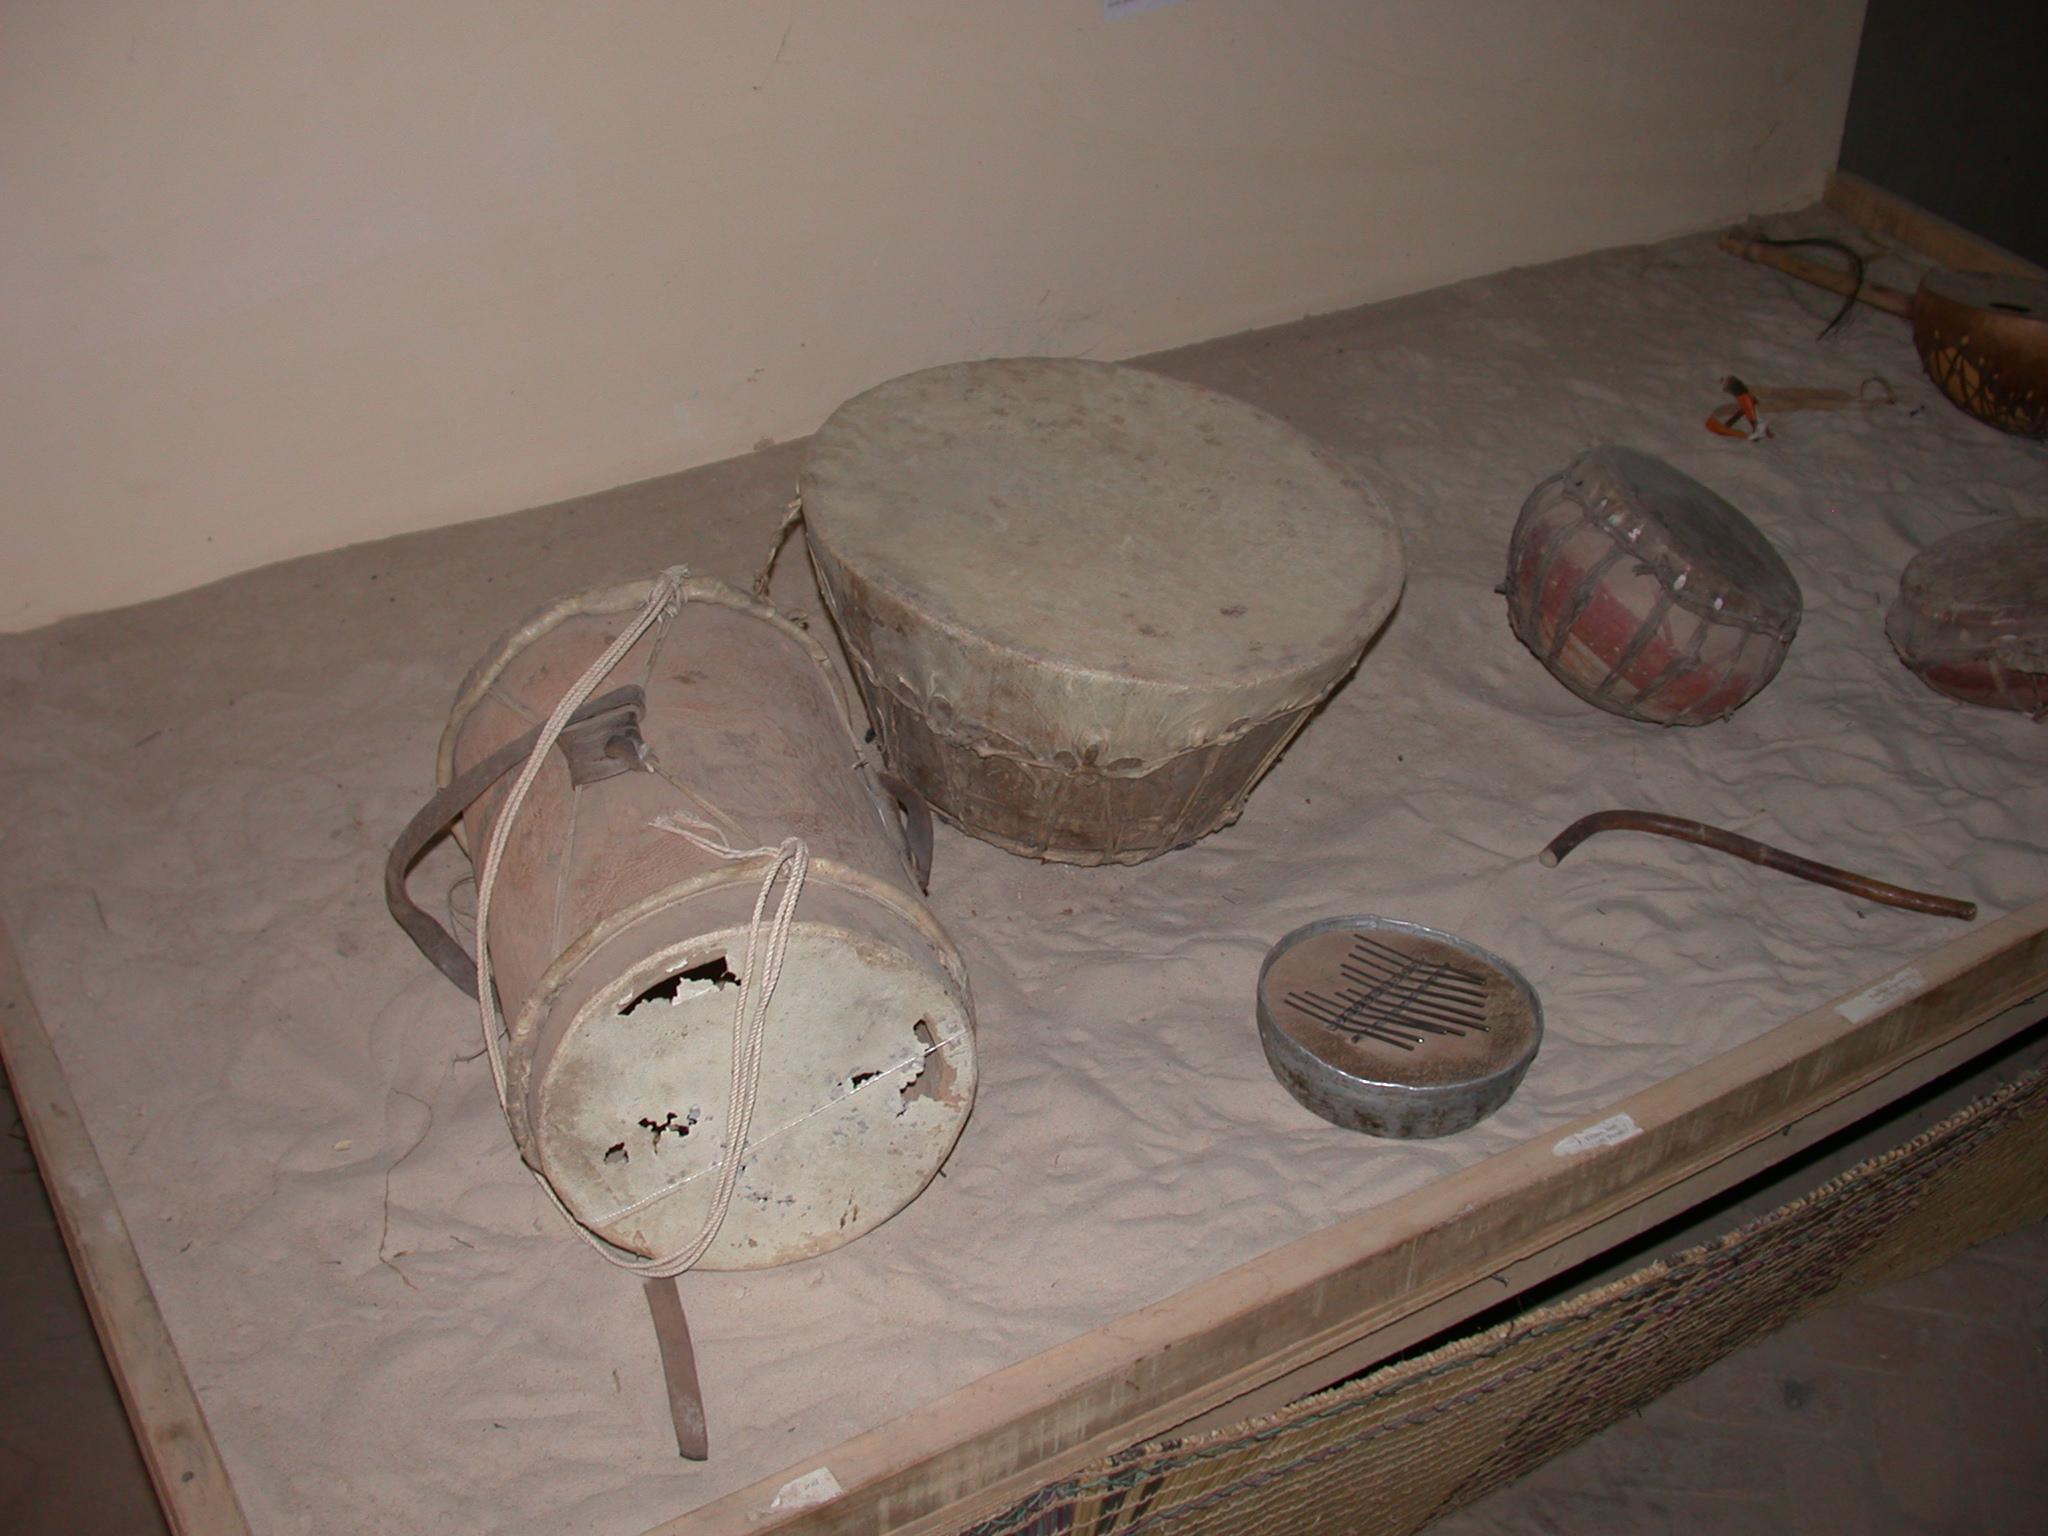 Musical Instruments, Timbuktu Ethnological Museum, Timbuktu, Mali